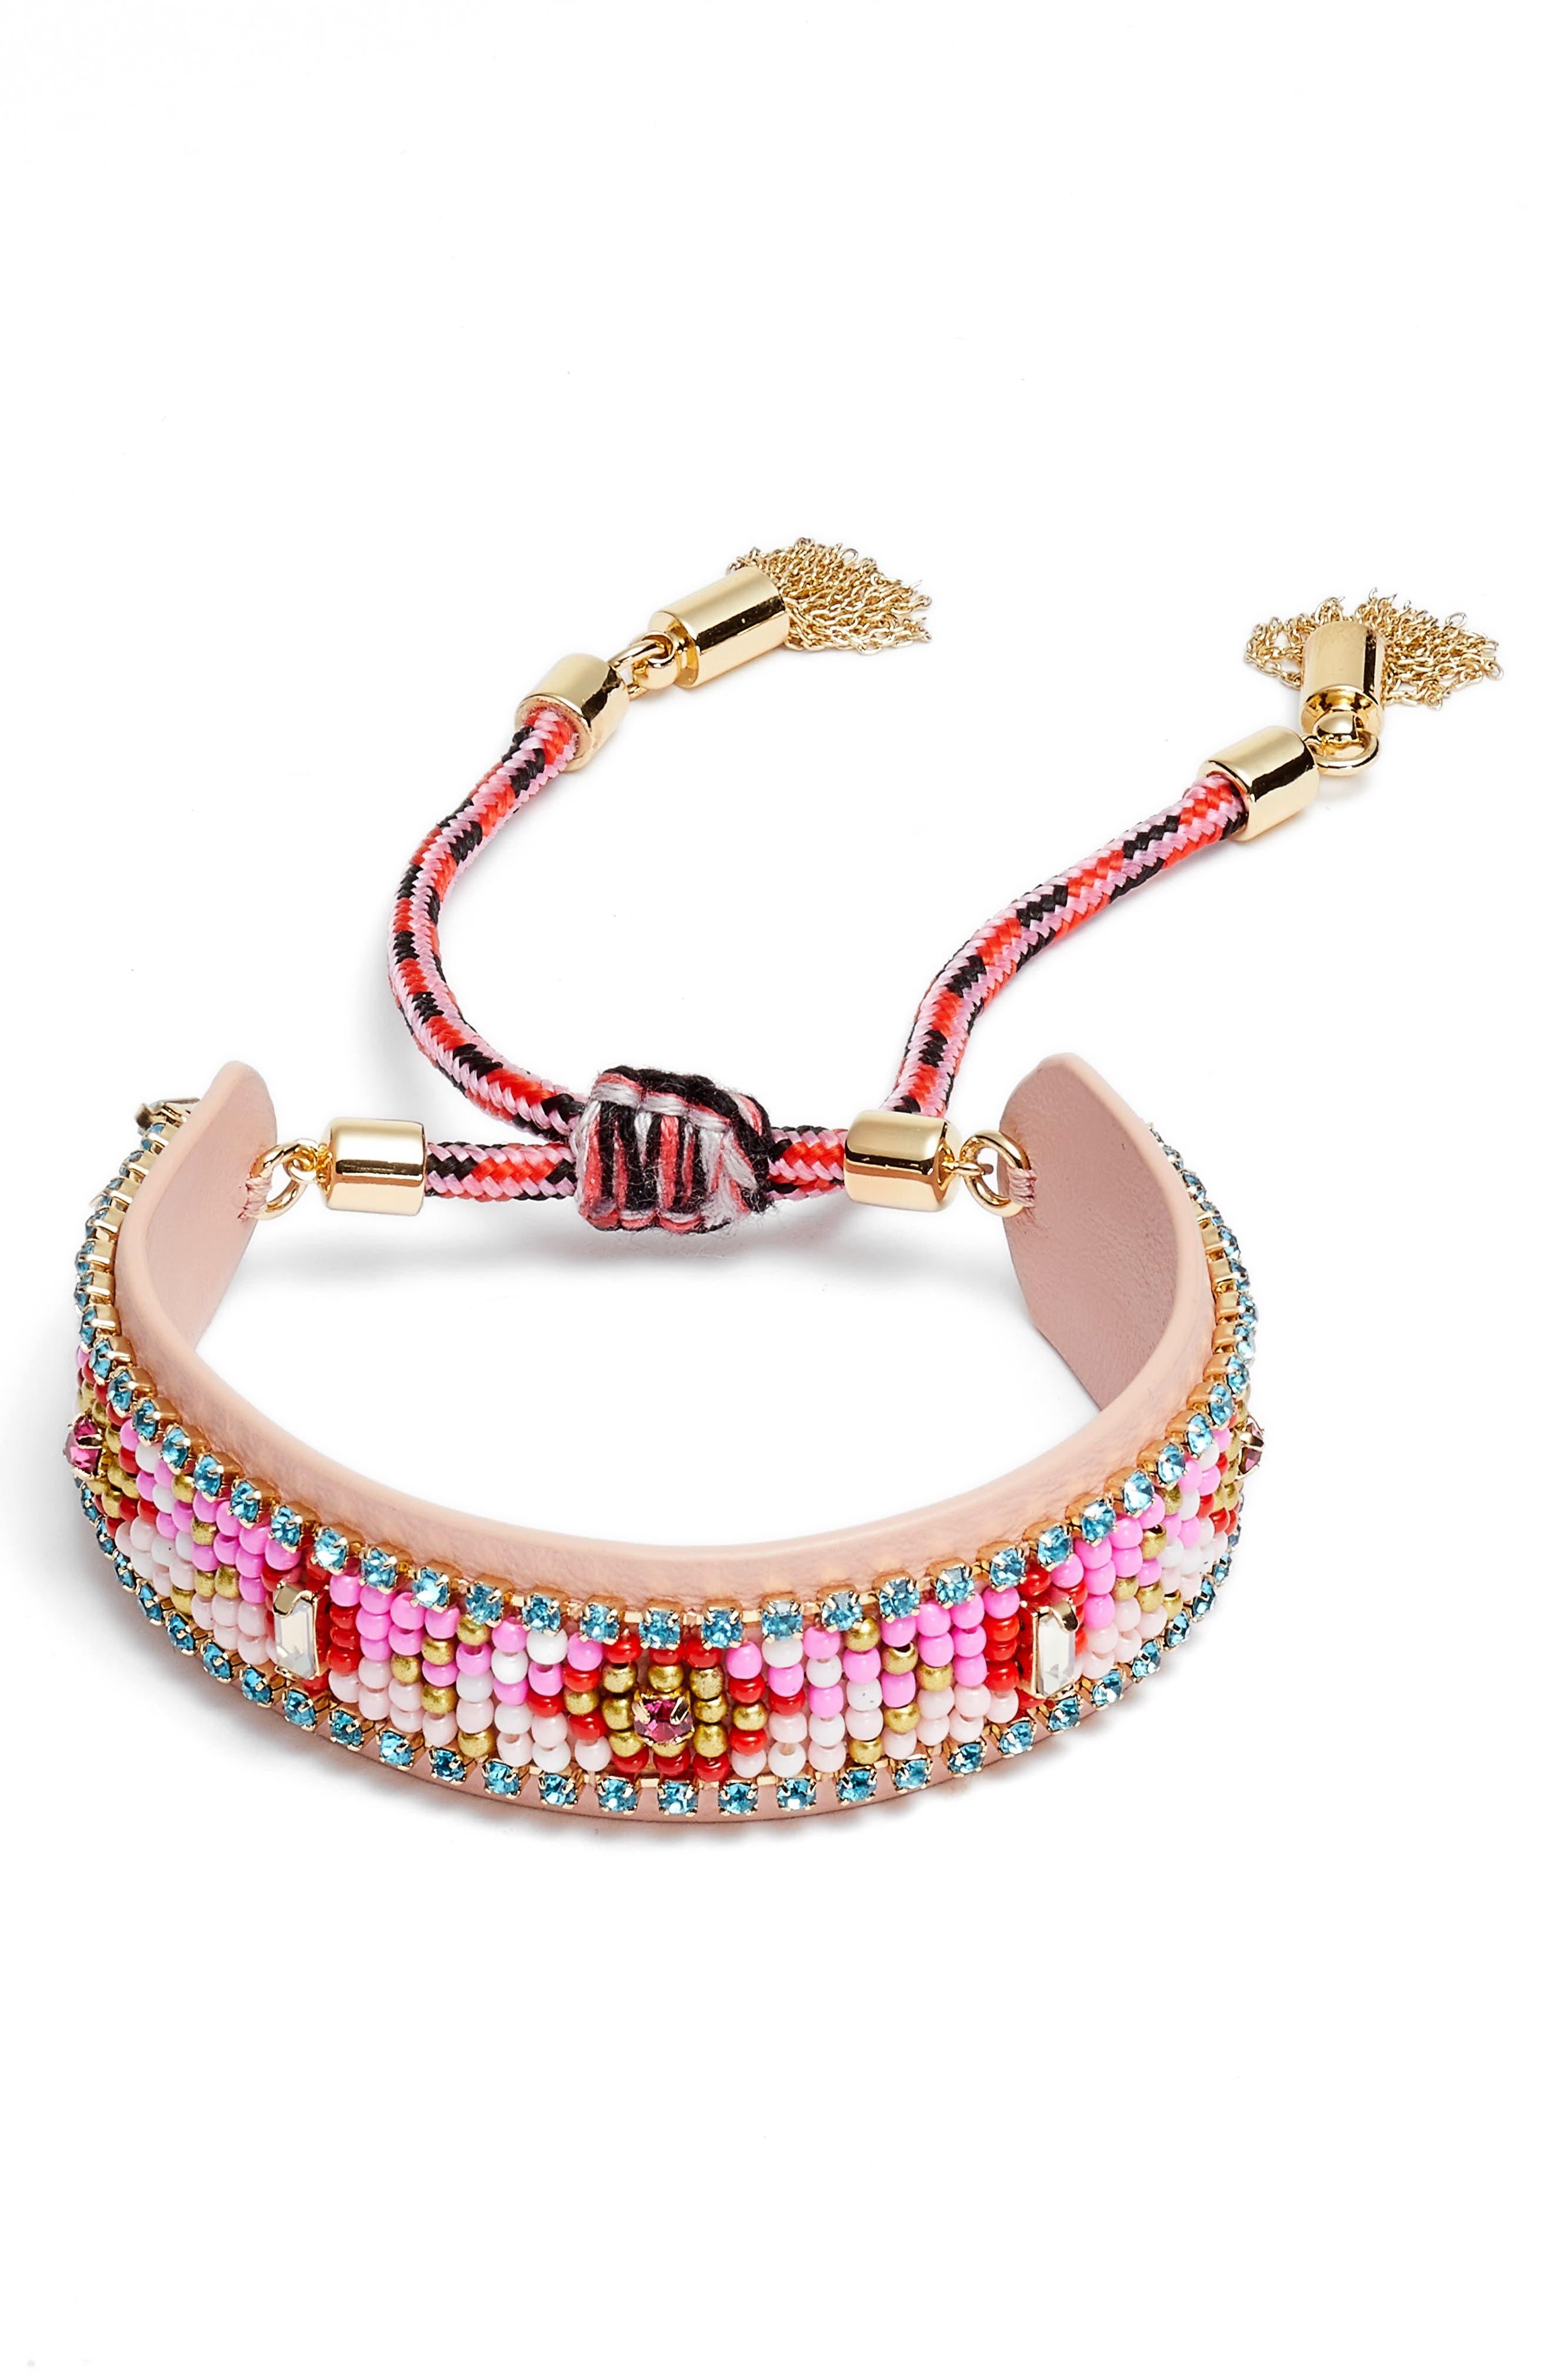 Seed Bead Friendship Bracelet,                             Main thumbnail 1, color,                             Pink Multi